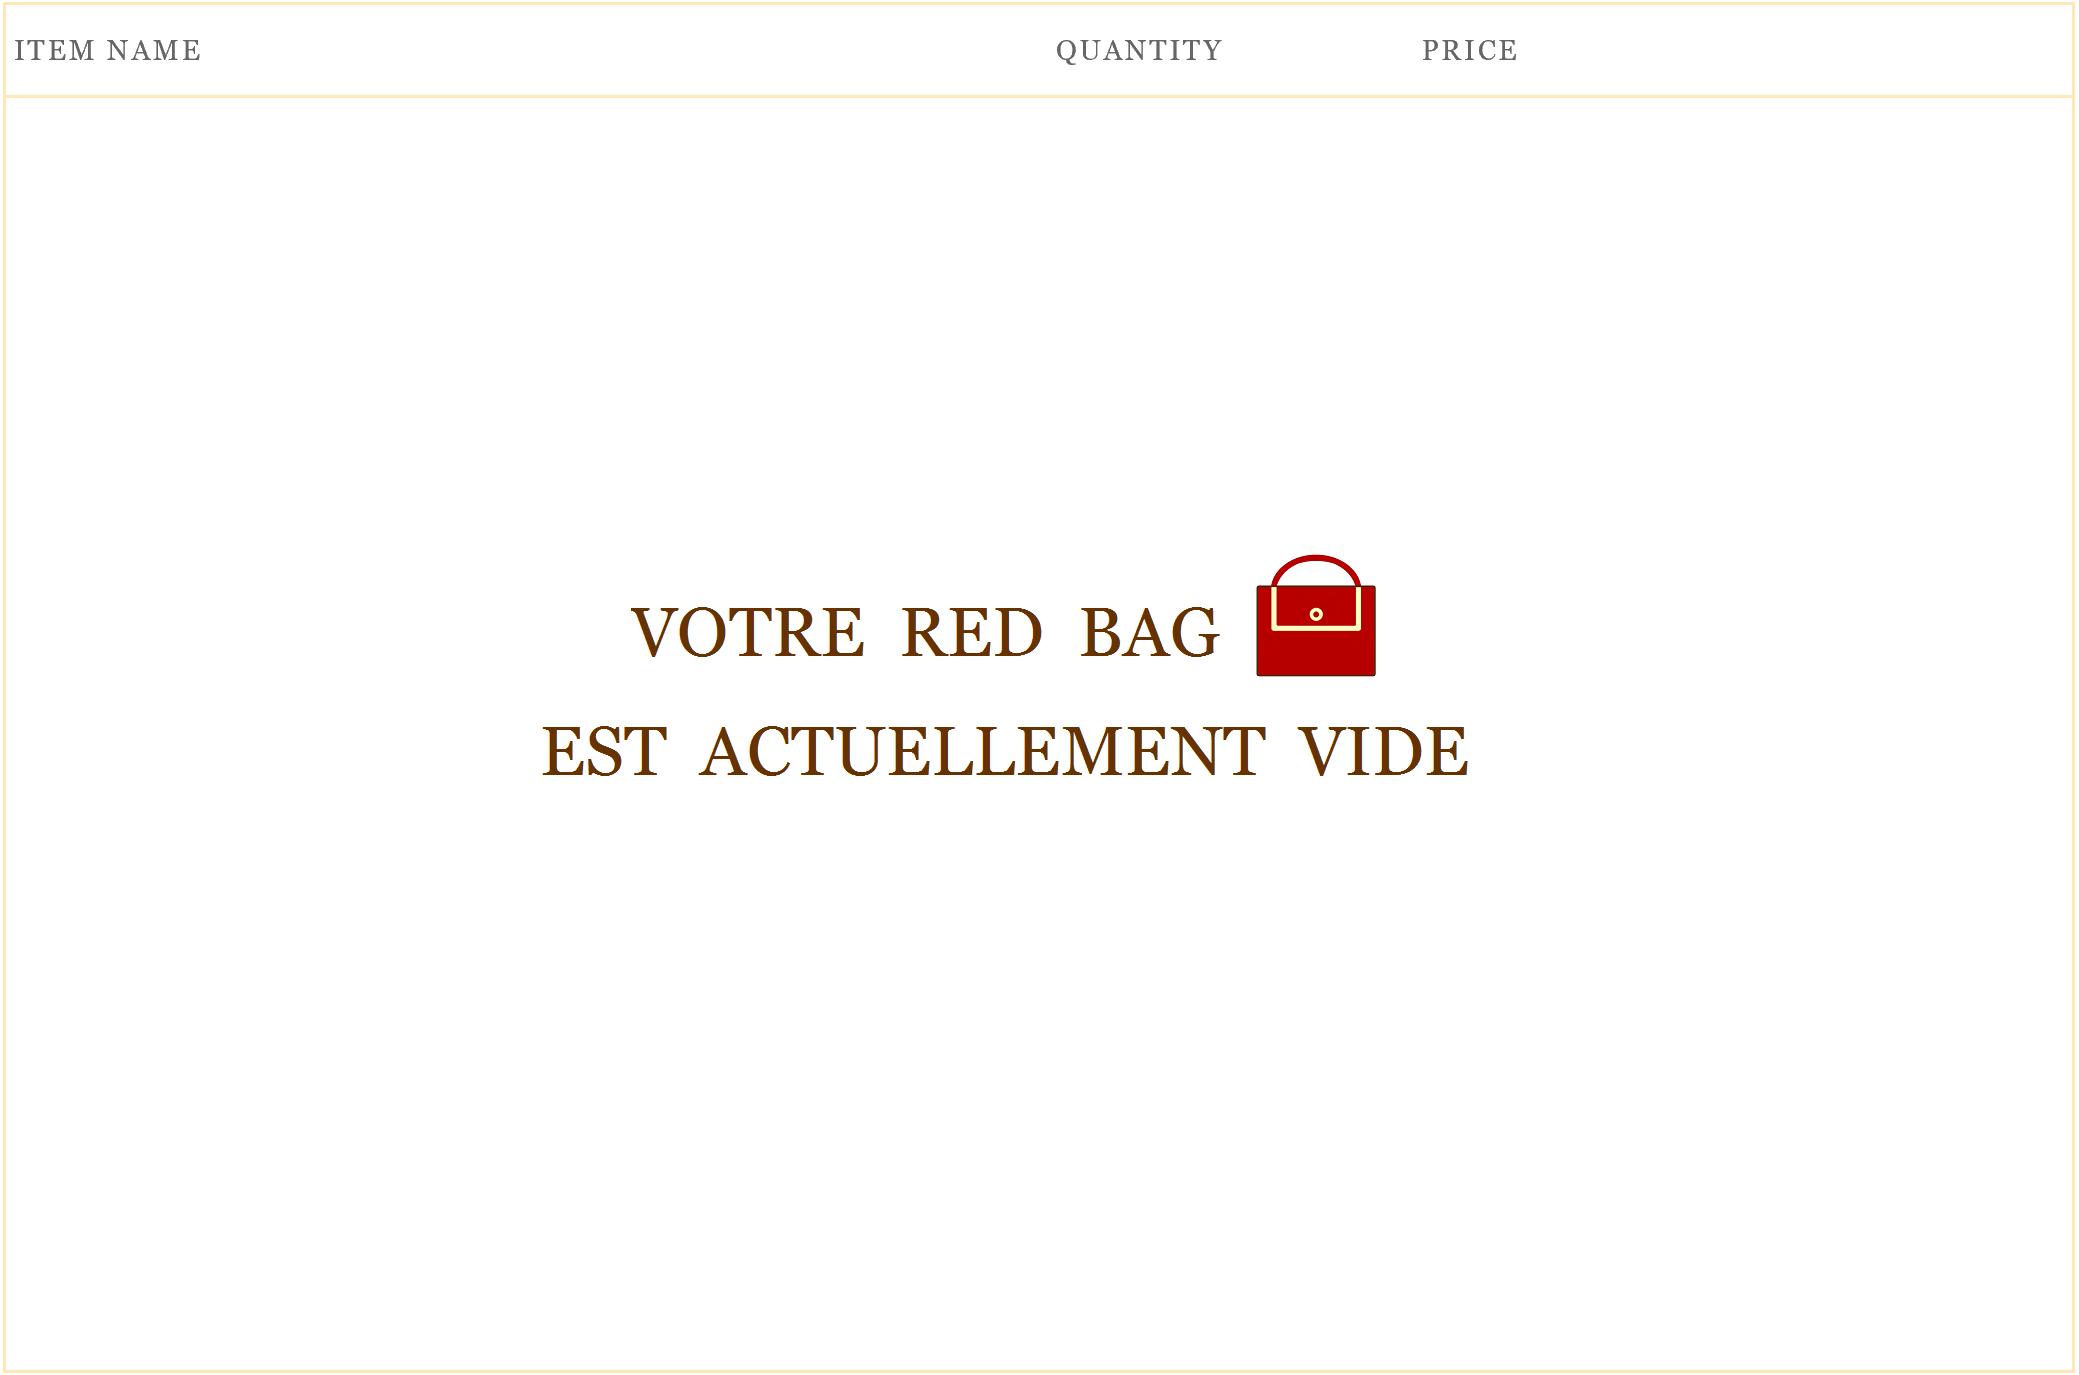 http://redkarawana.com/wp-content/uploads/2016/07/0l-FR-Red-Bag-Empty-Image.png